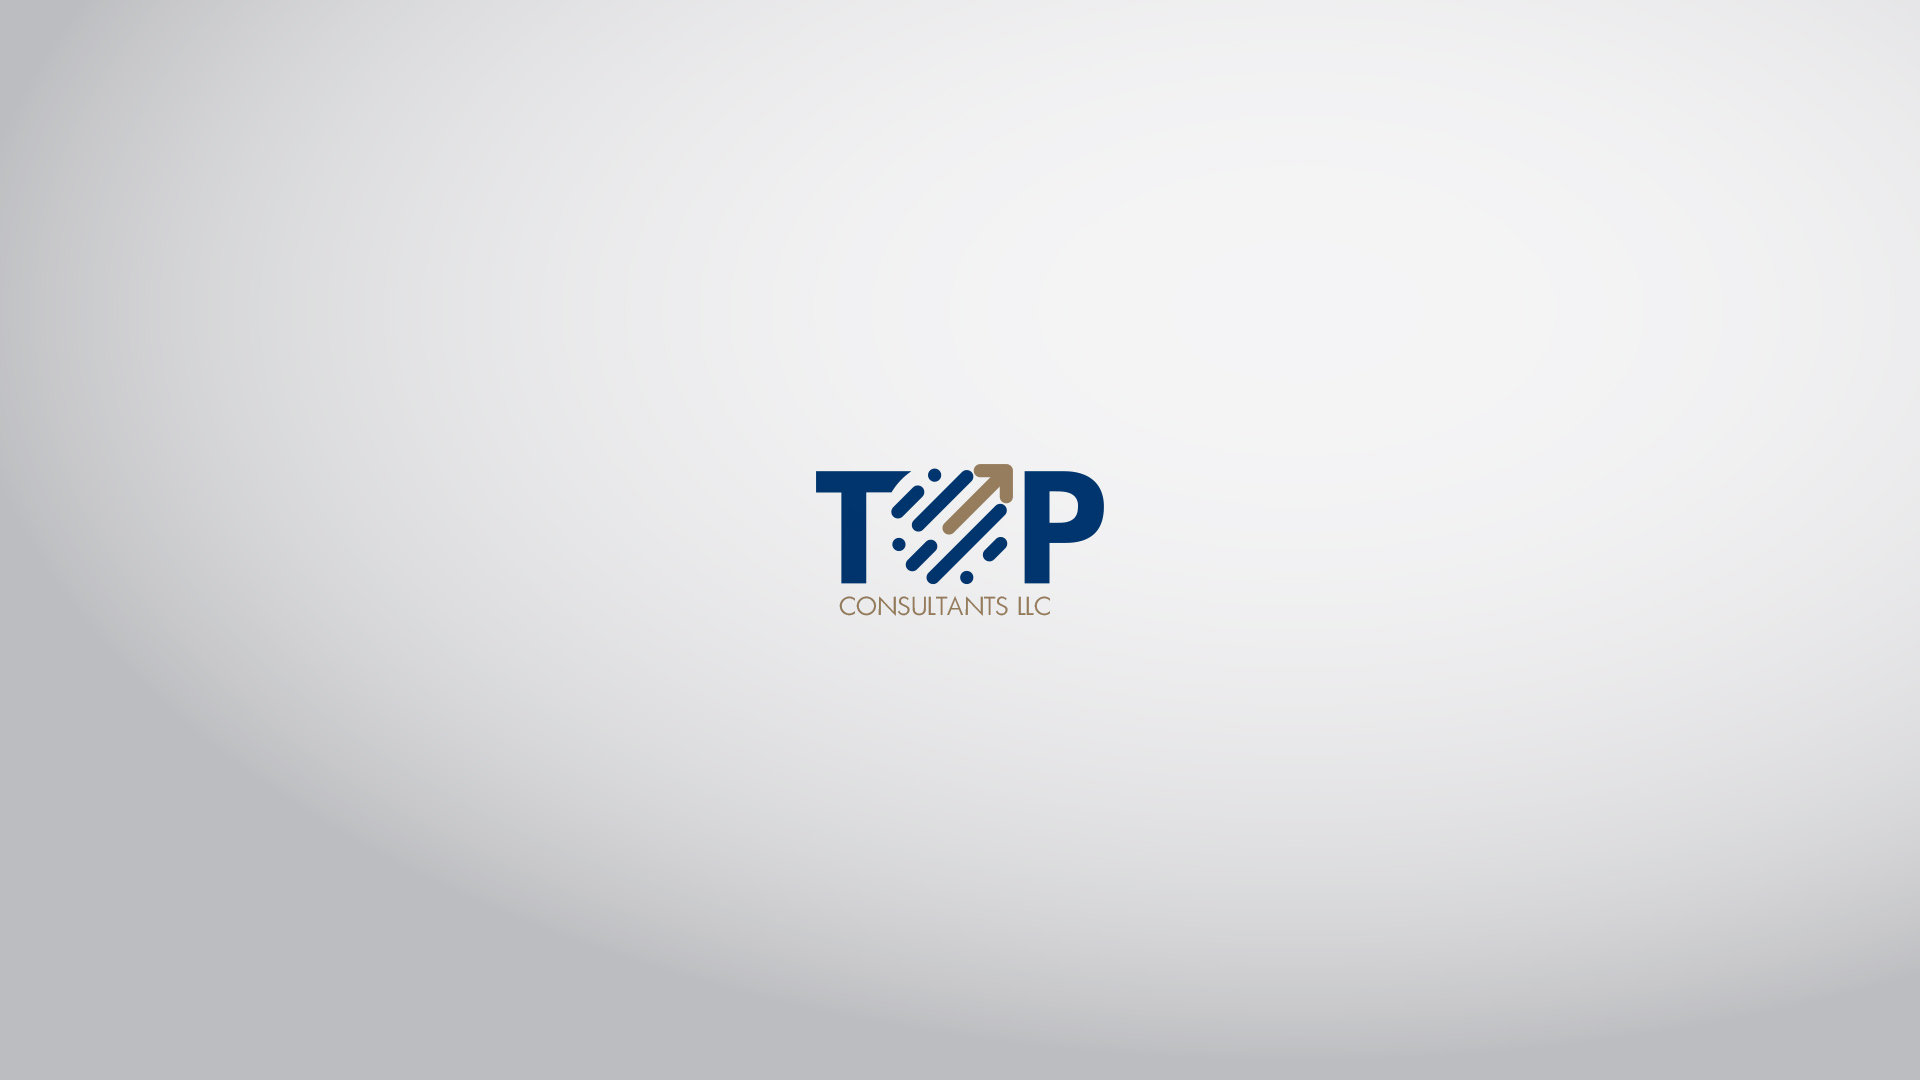 Top Consultants LLC